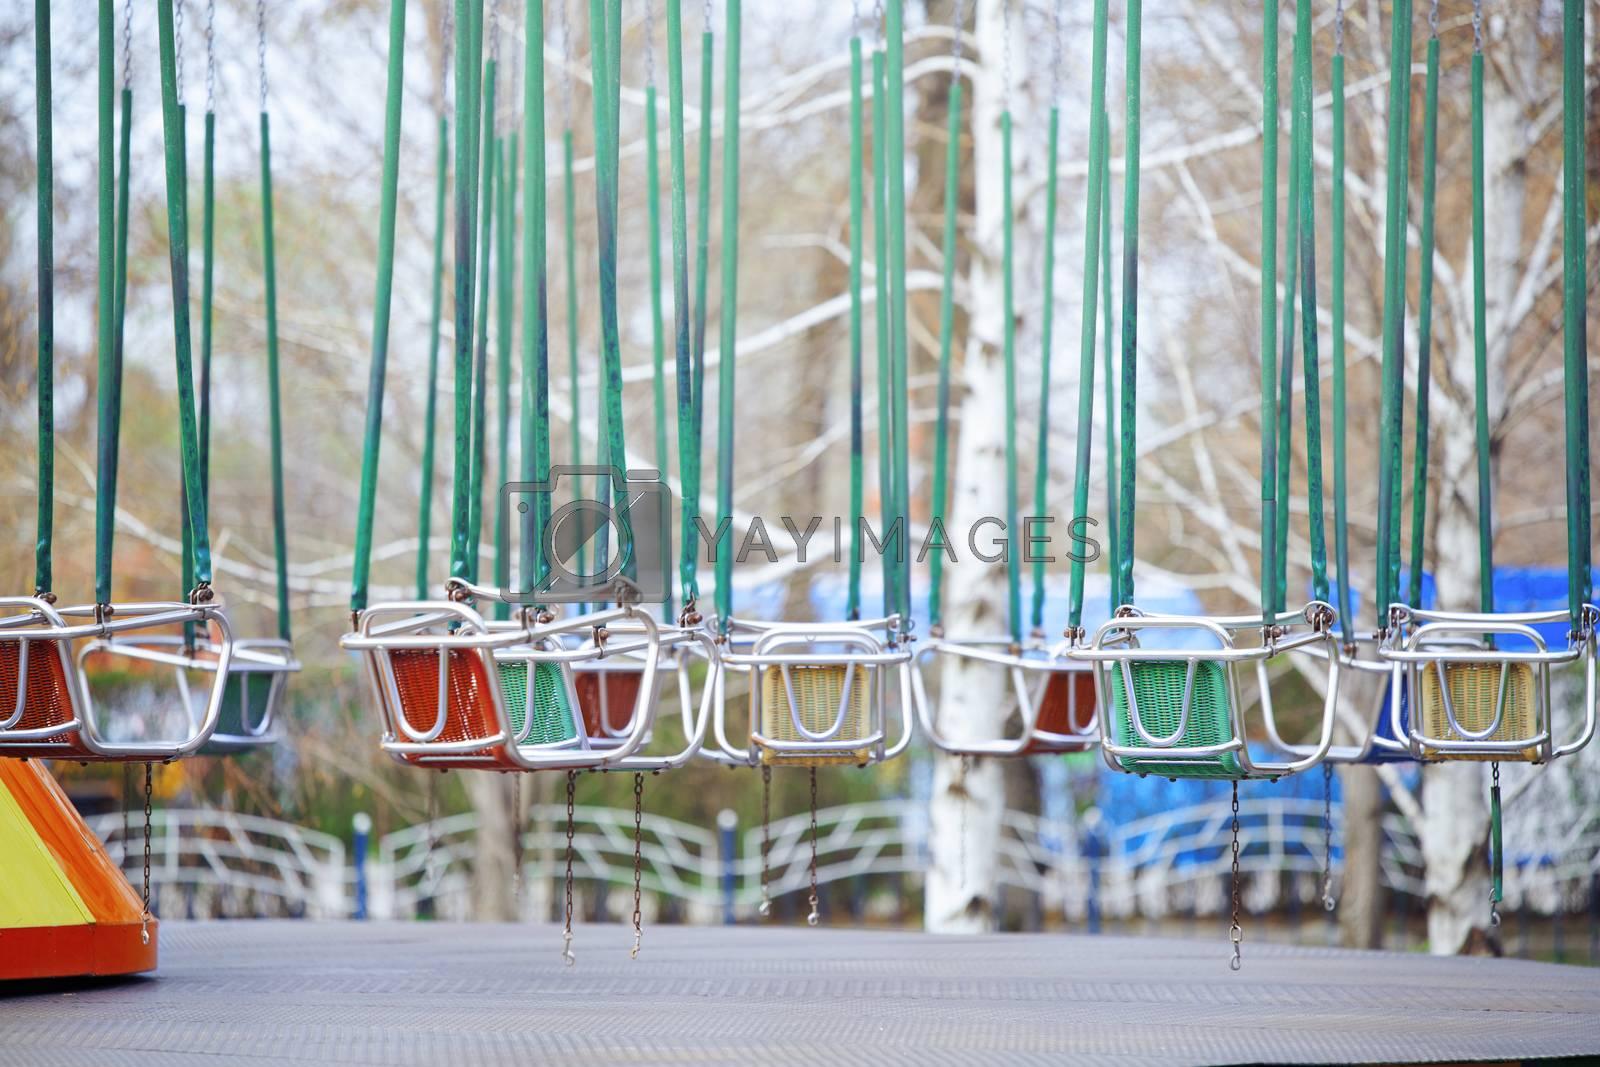 Empty chain swing in amuzement park